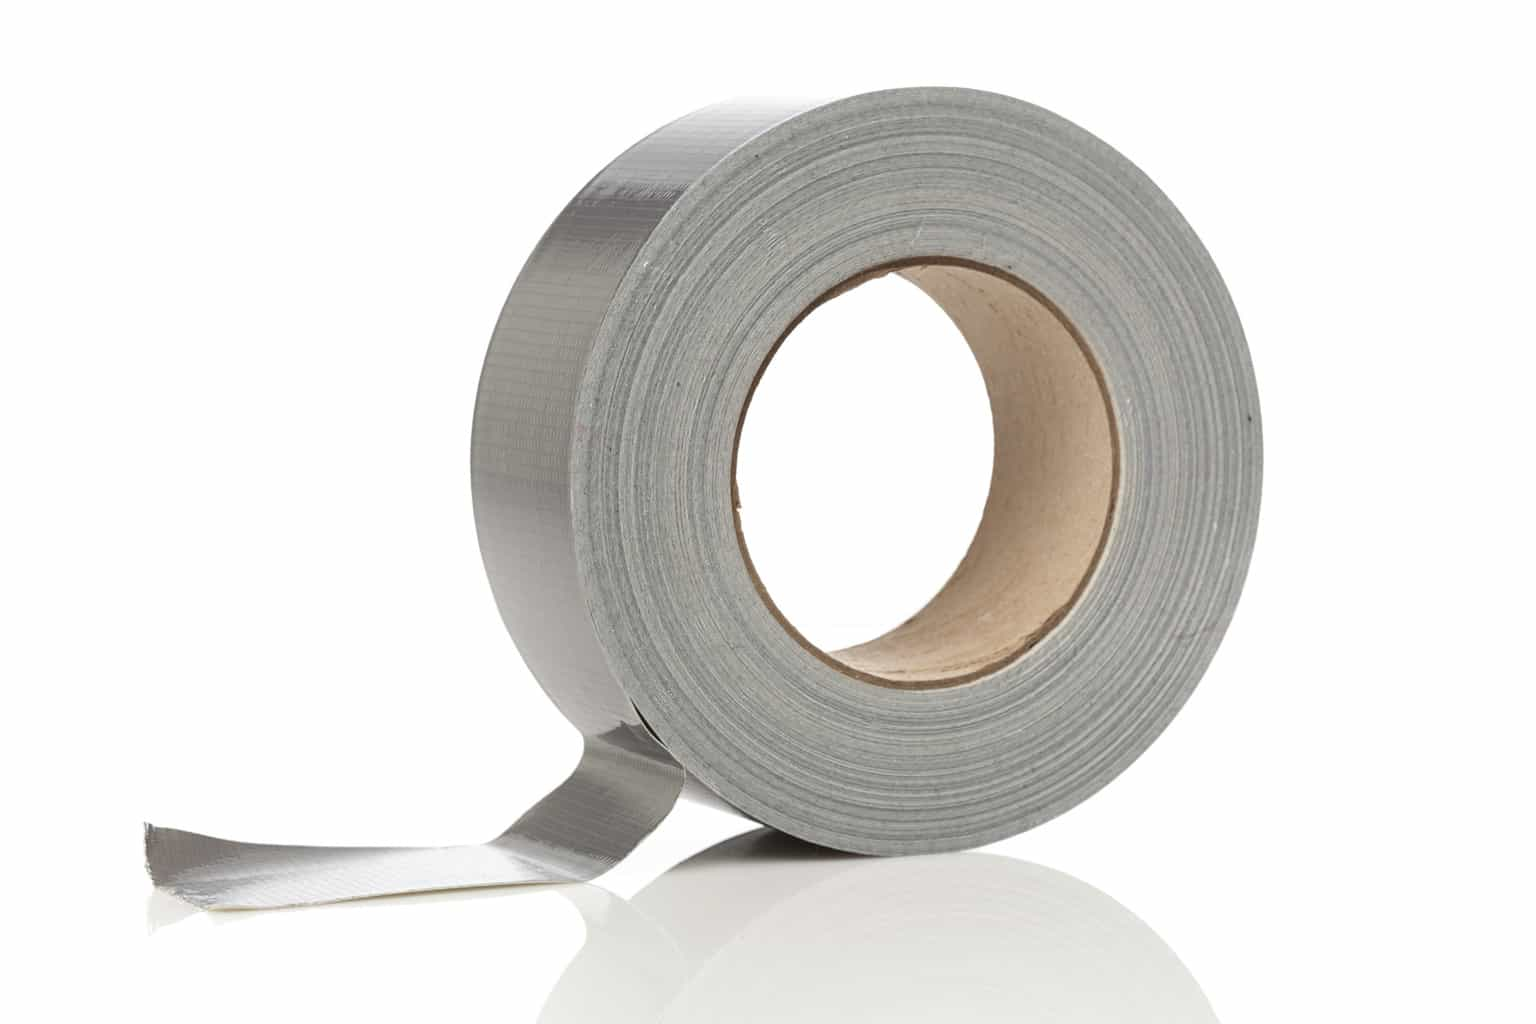 Duct Tape Fire Starter: